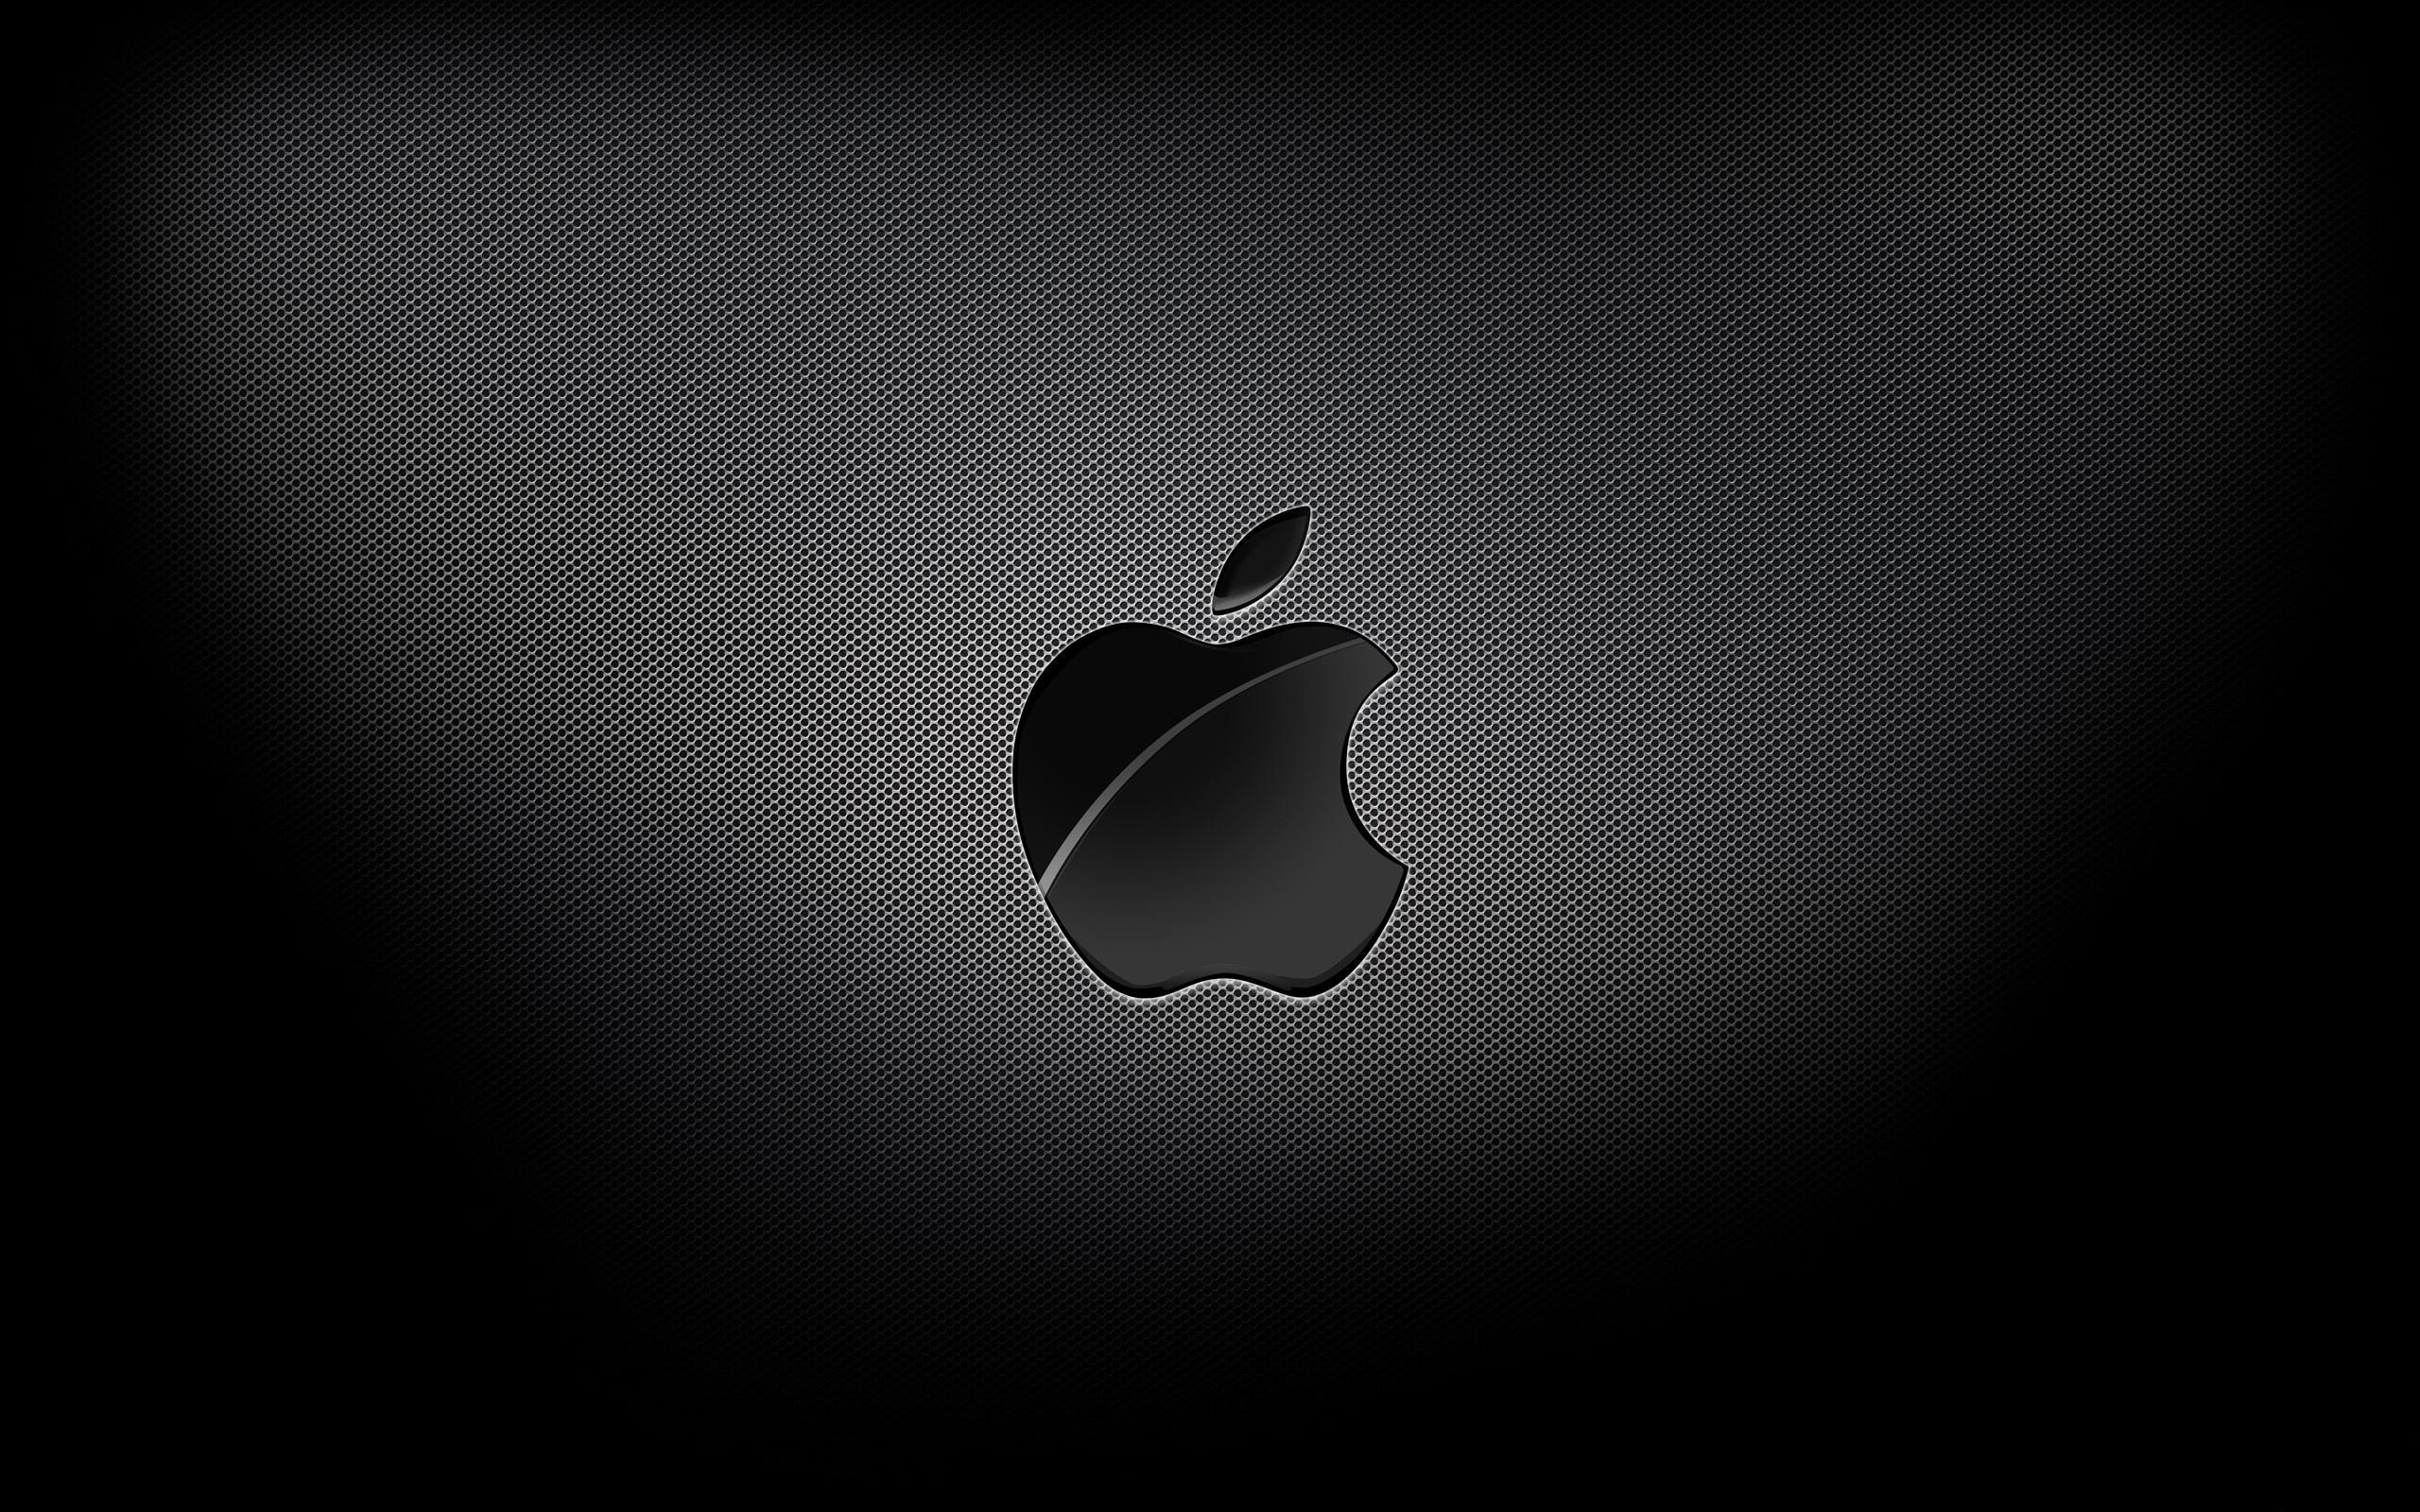 Aapple Black Background Mac Wallpaper Download Free Mac Wallpapers